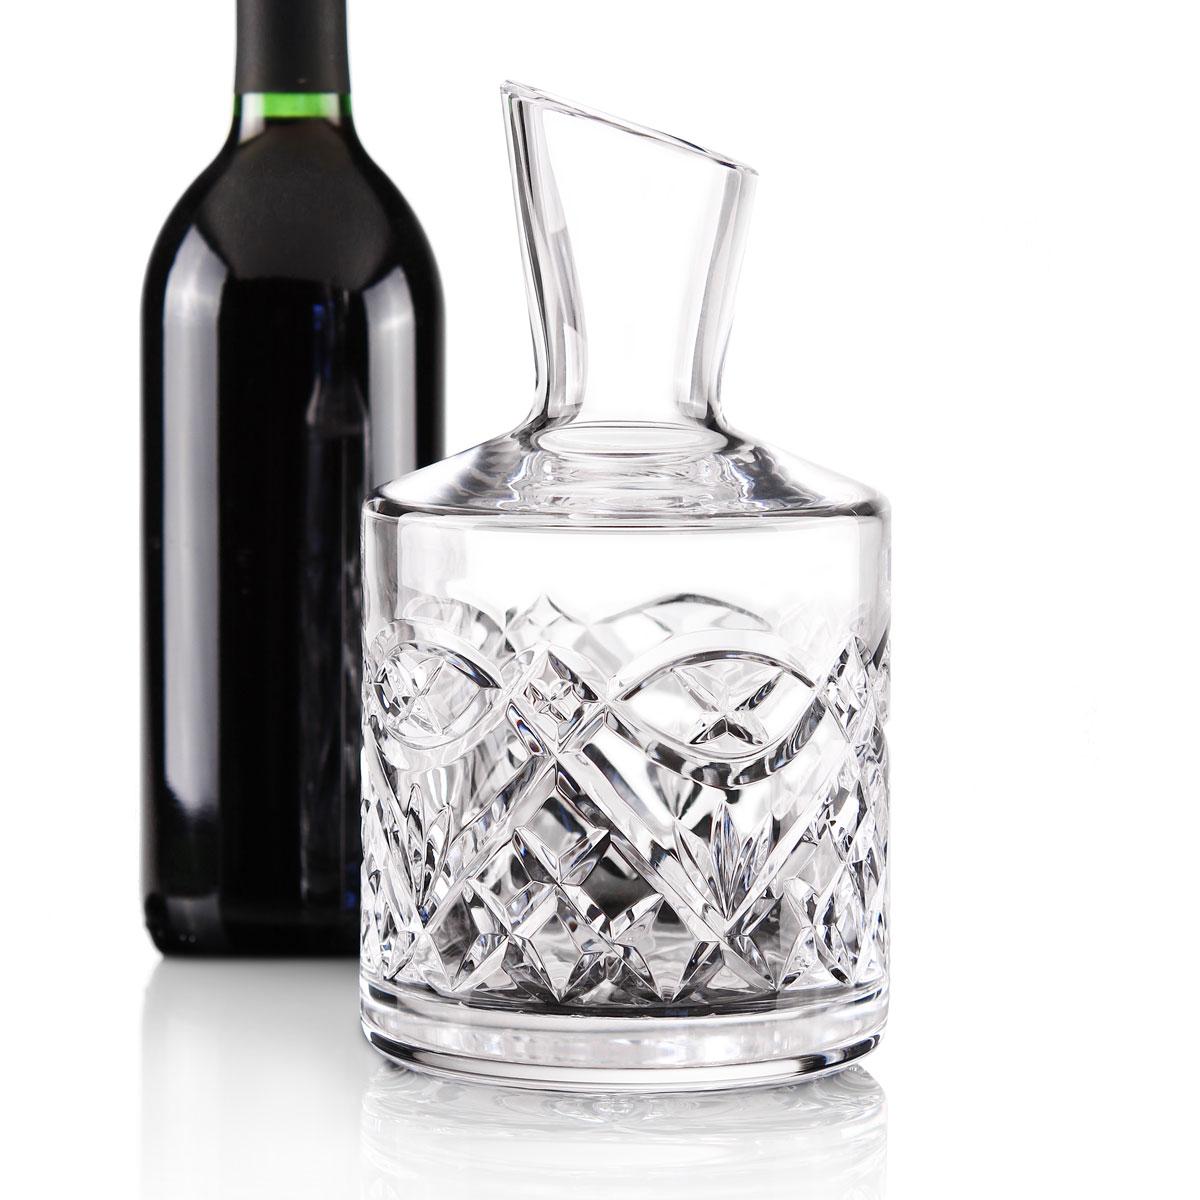 Cashs Ireland, Celtic Ring Crystal Wine Carafe